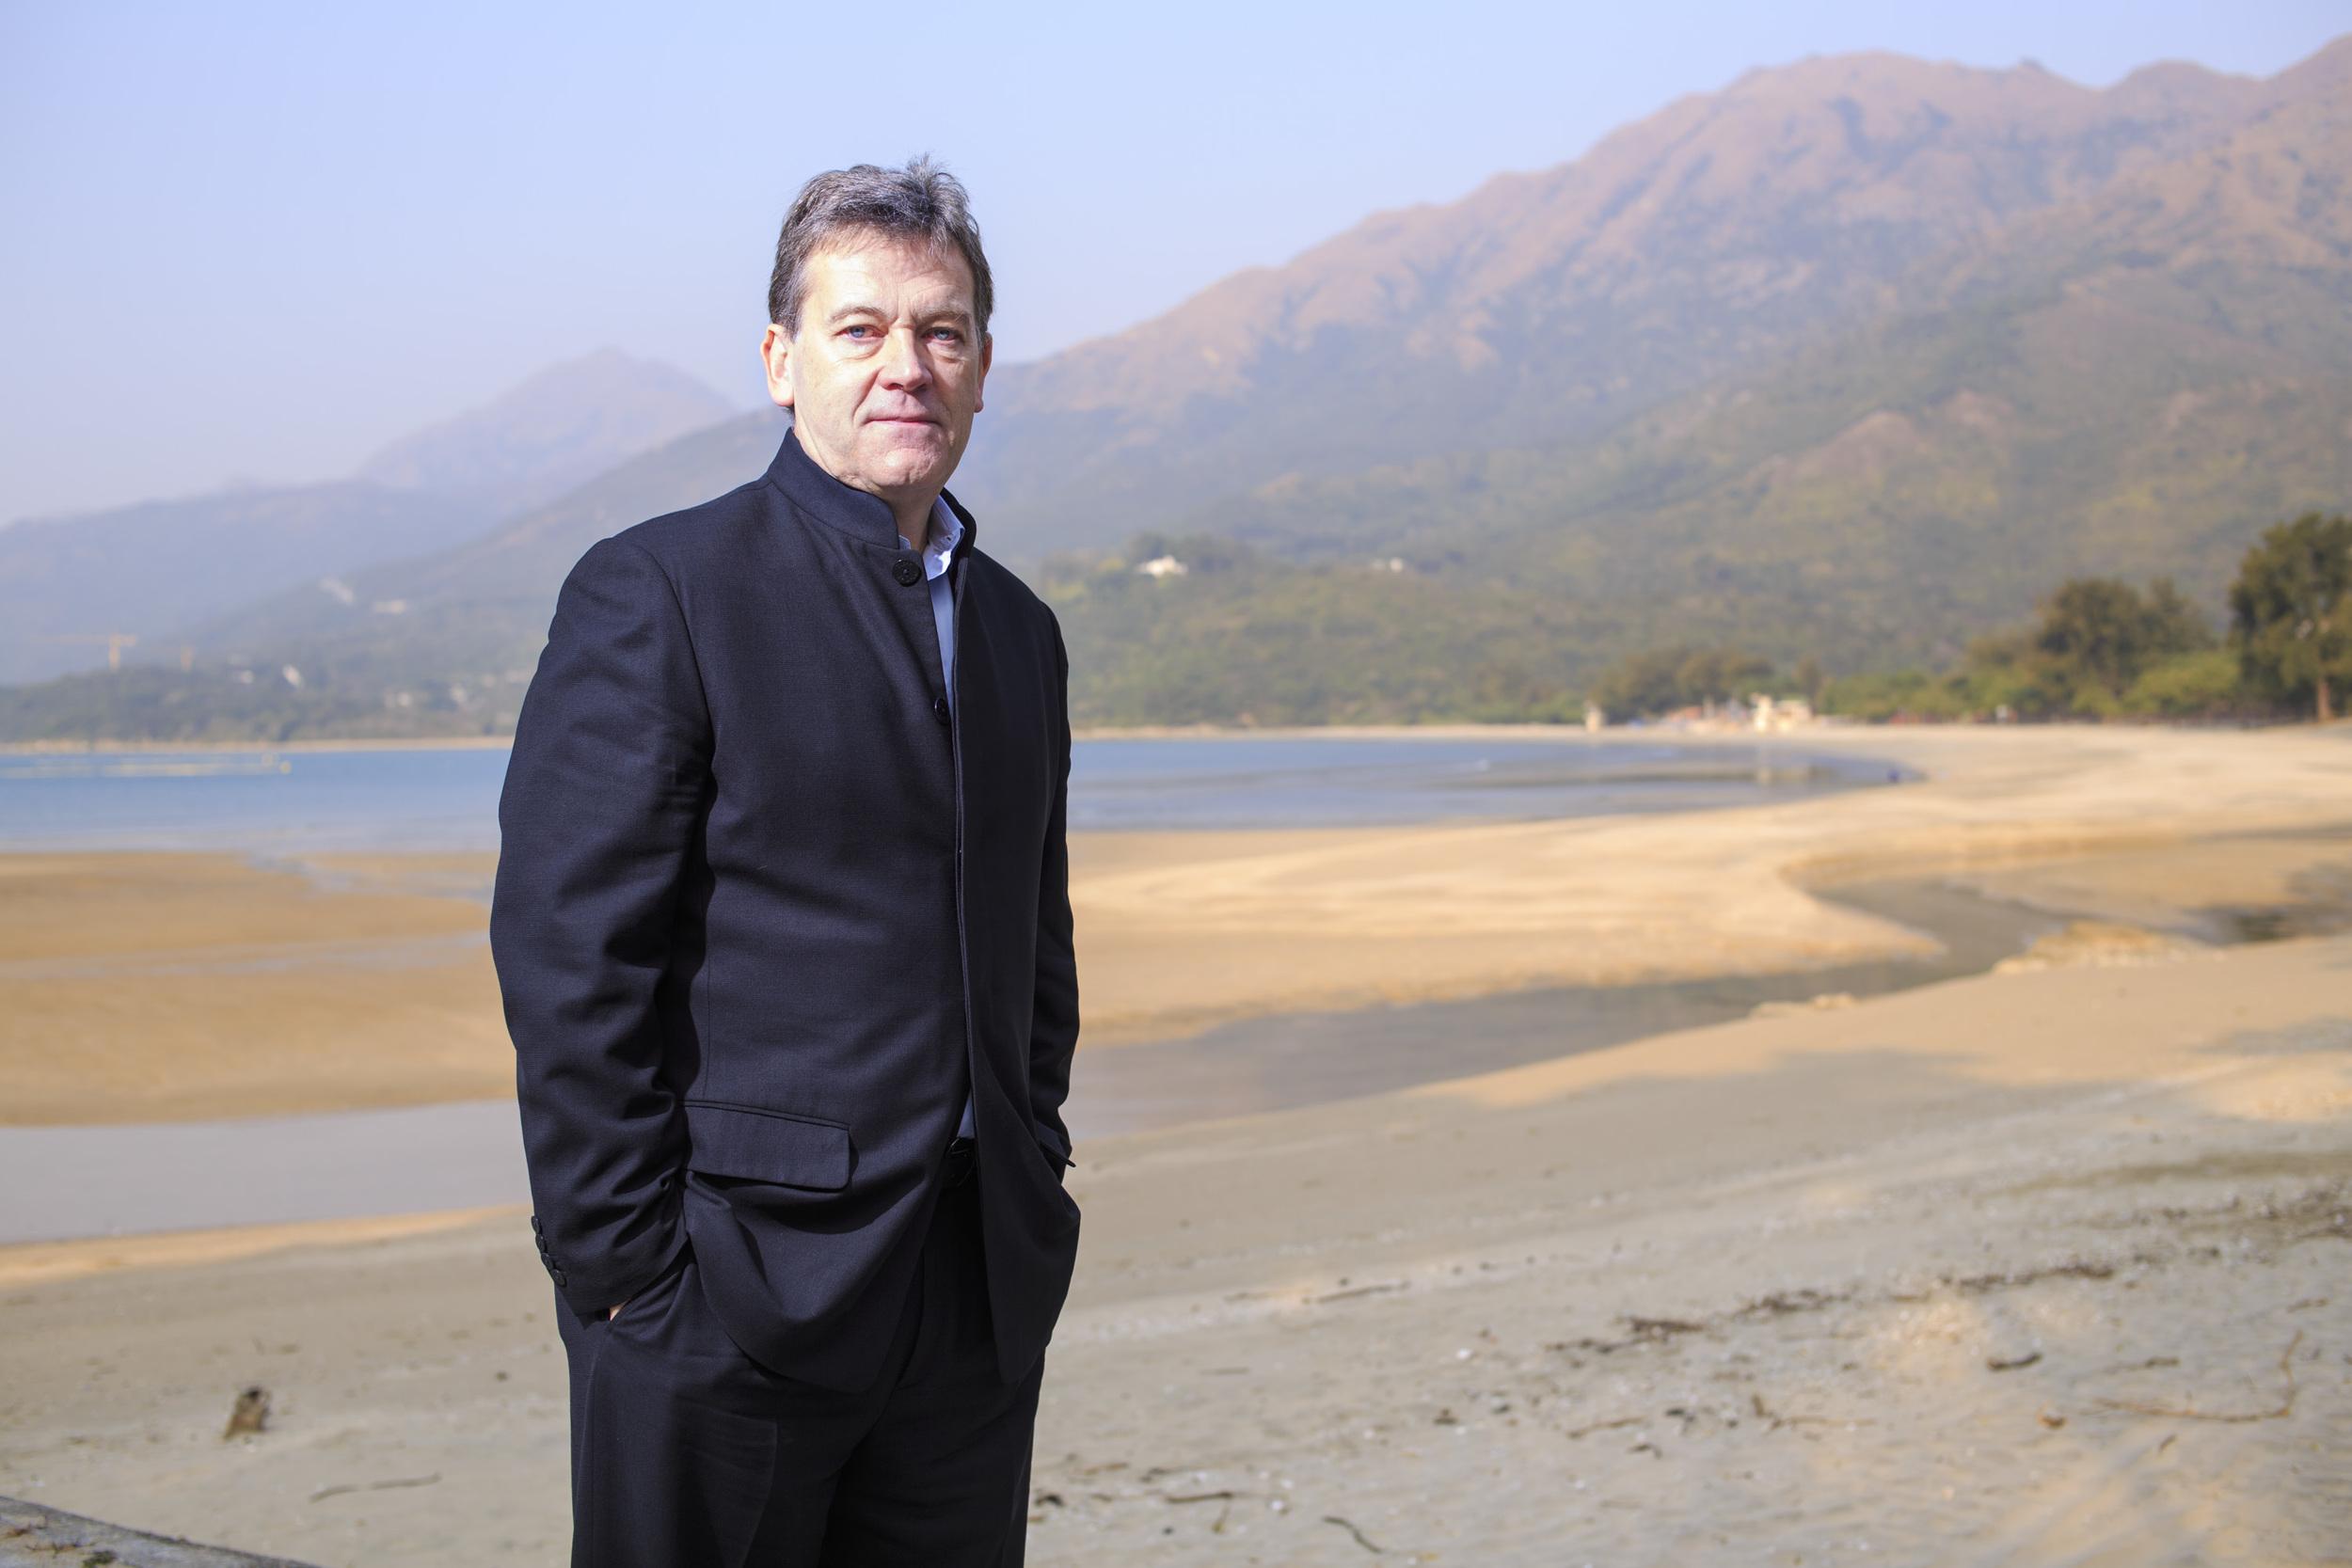 Barrie Goodridge, Chairman & CEO (Asia) for Edipresse Asia Ltd